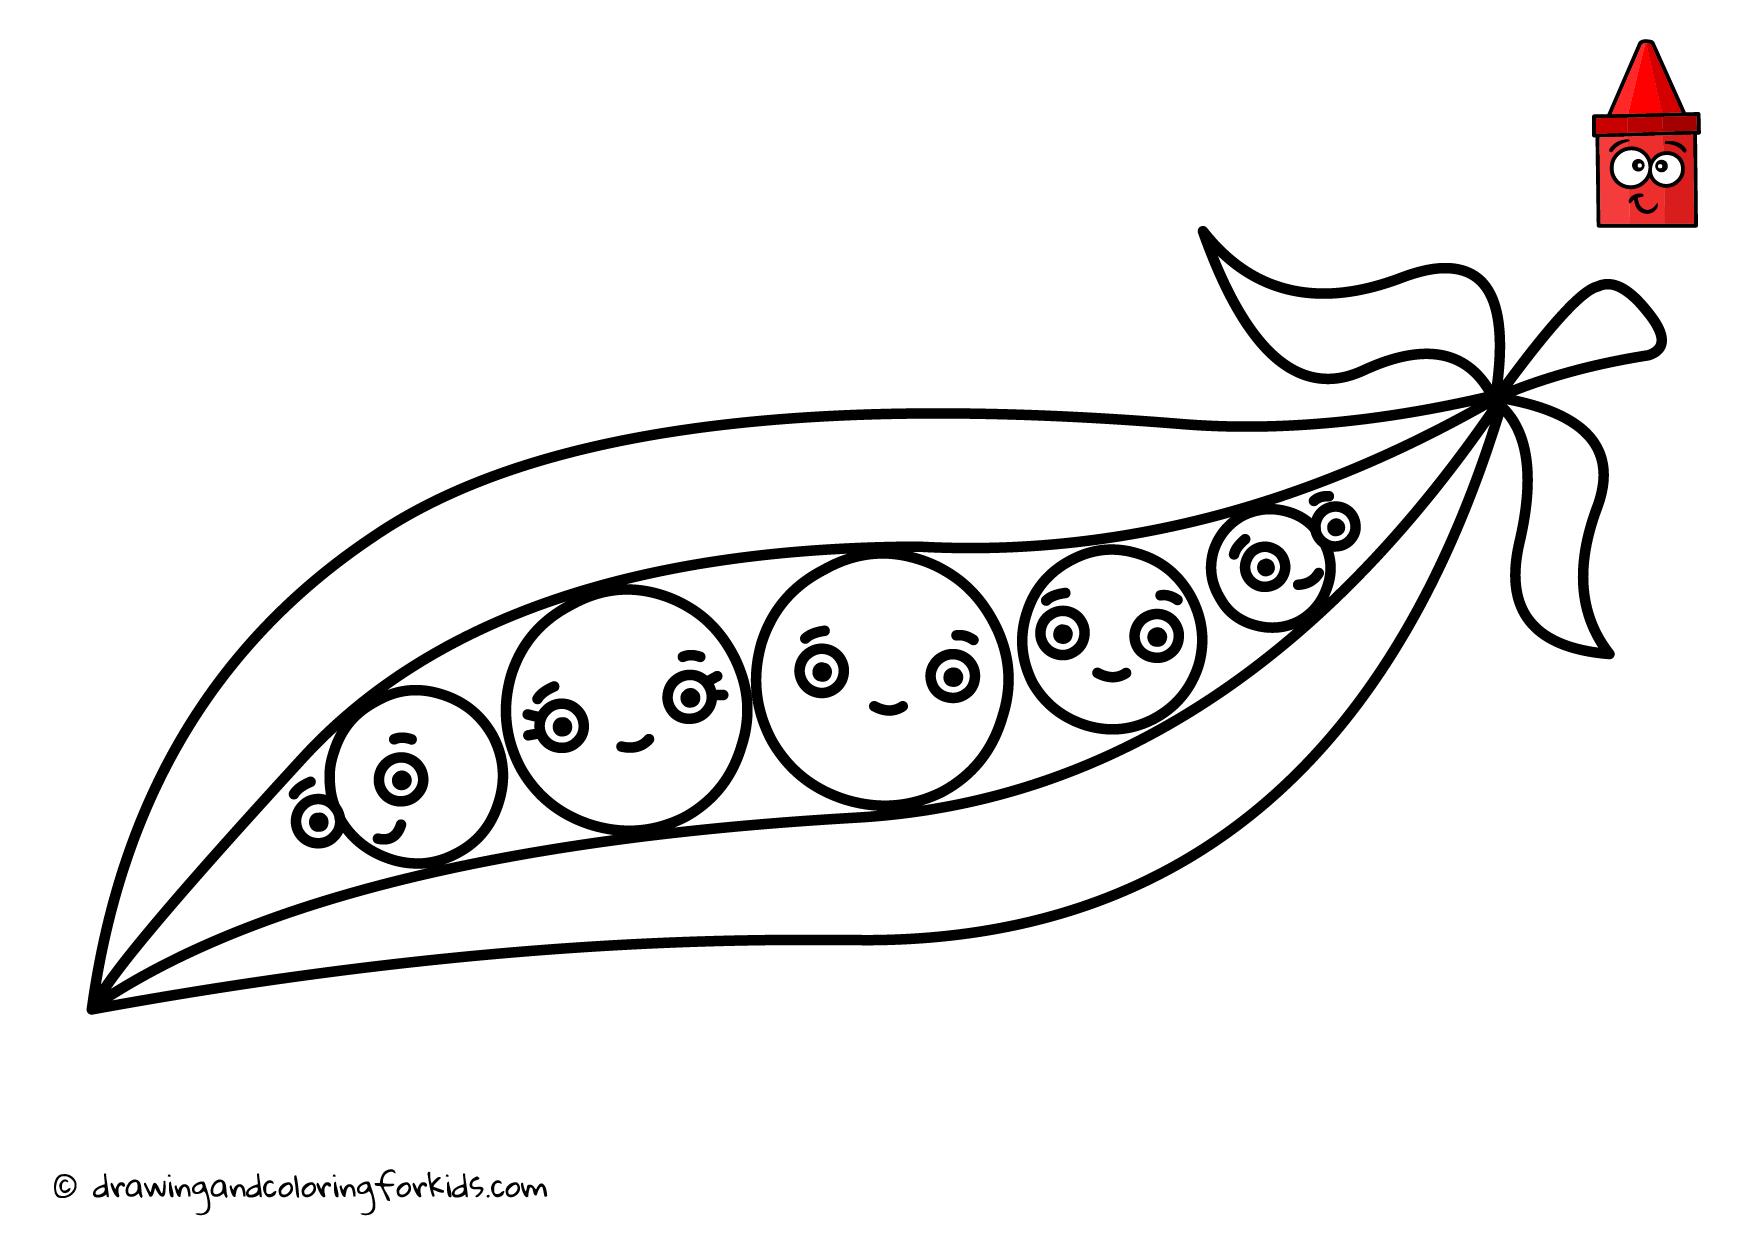 Drawing Vegetables